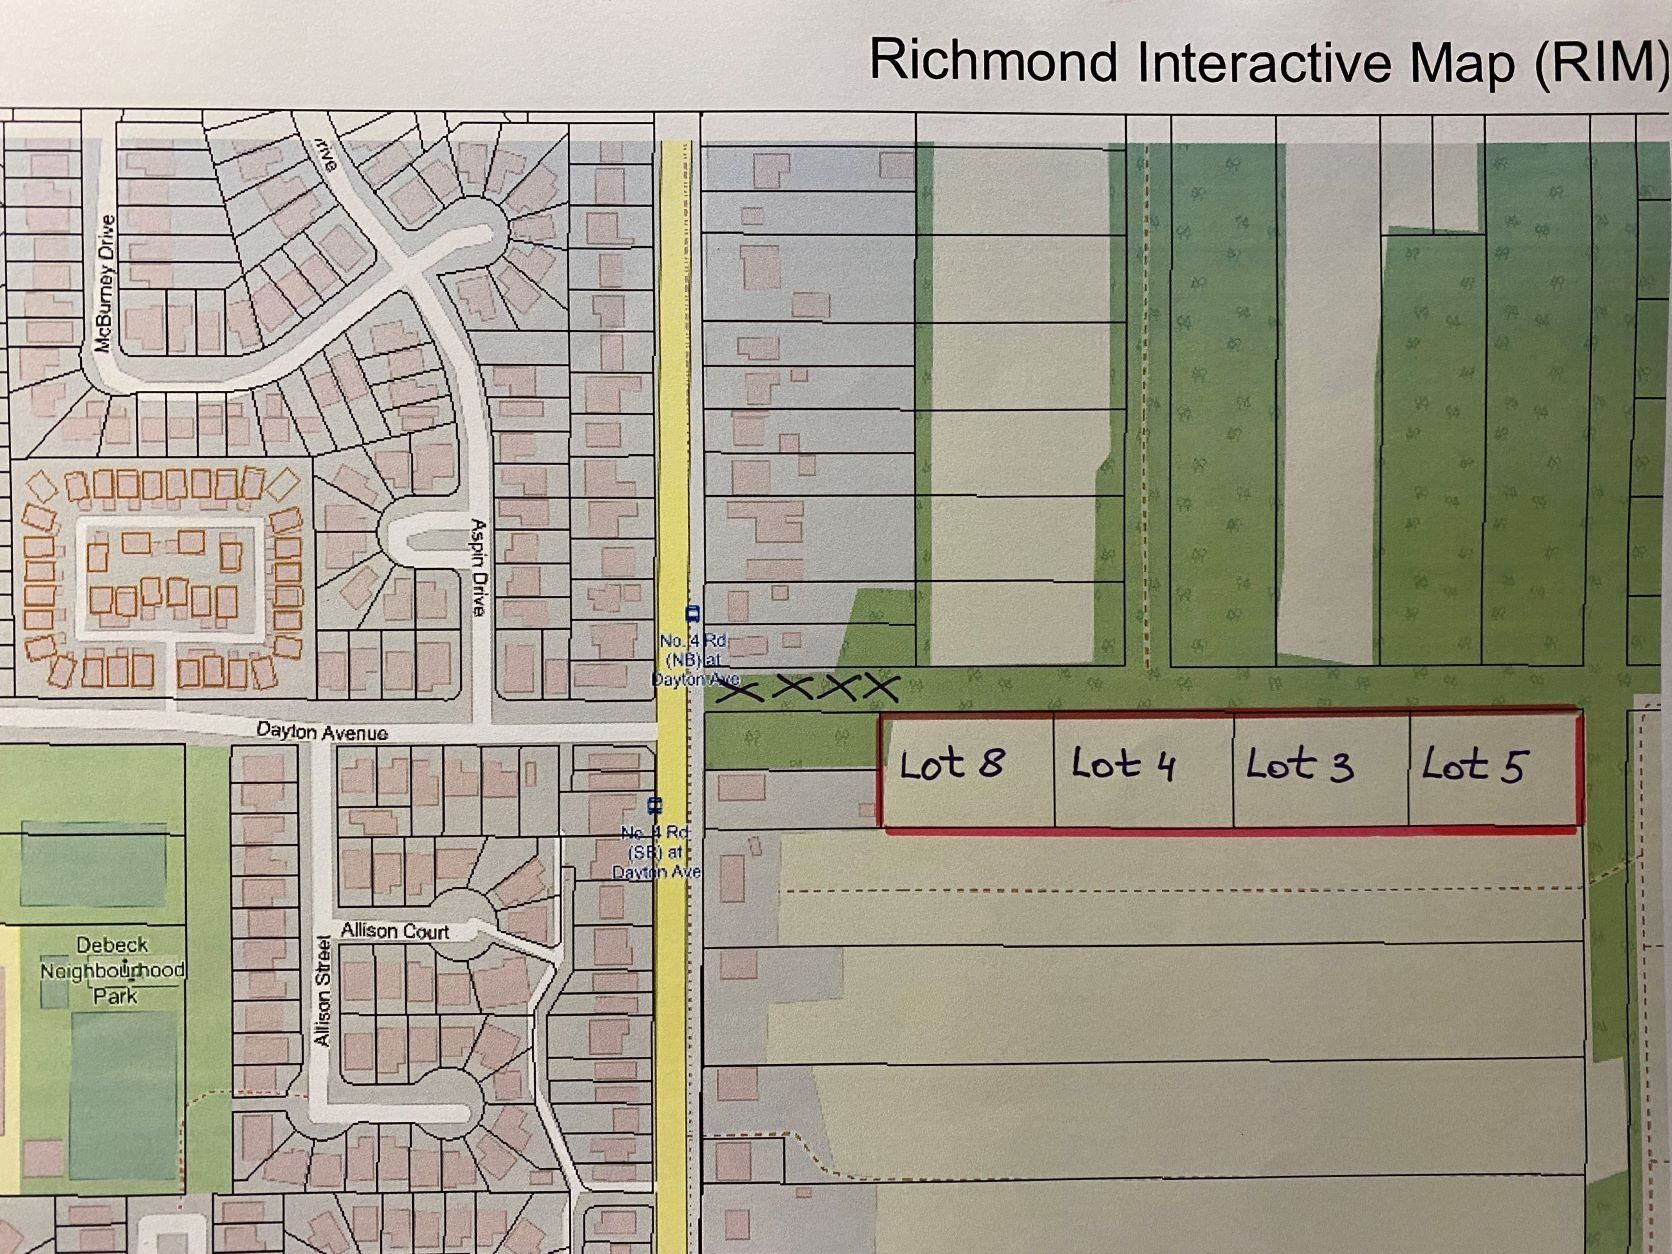 Main Photo: Lot 8 ,4,3,5 NO ACCESS in Richmond: McLennan Land for sale : MLS®# R2609837